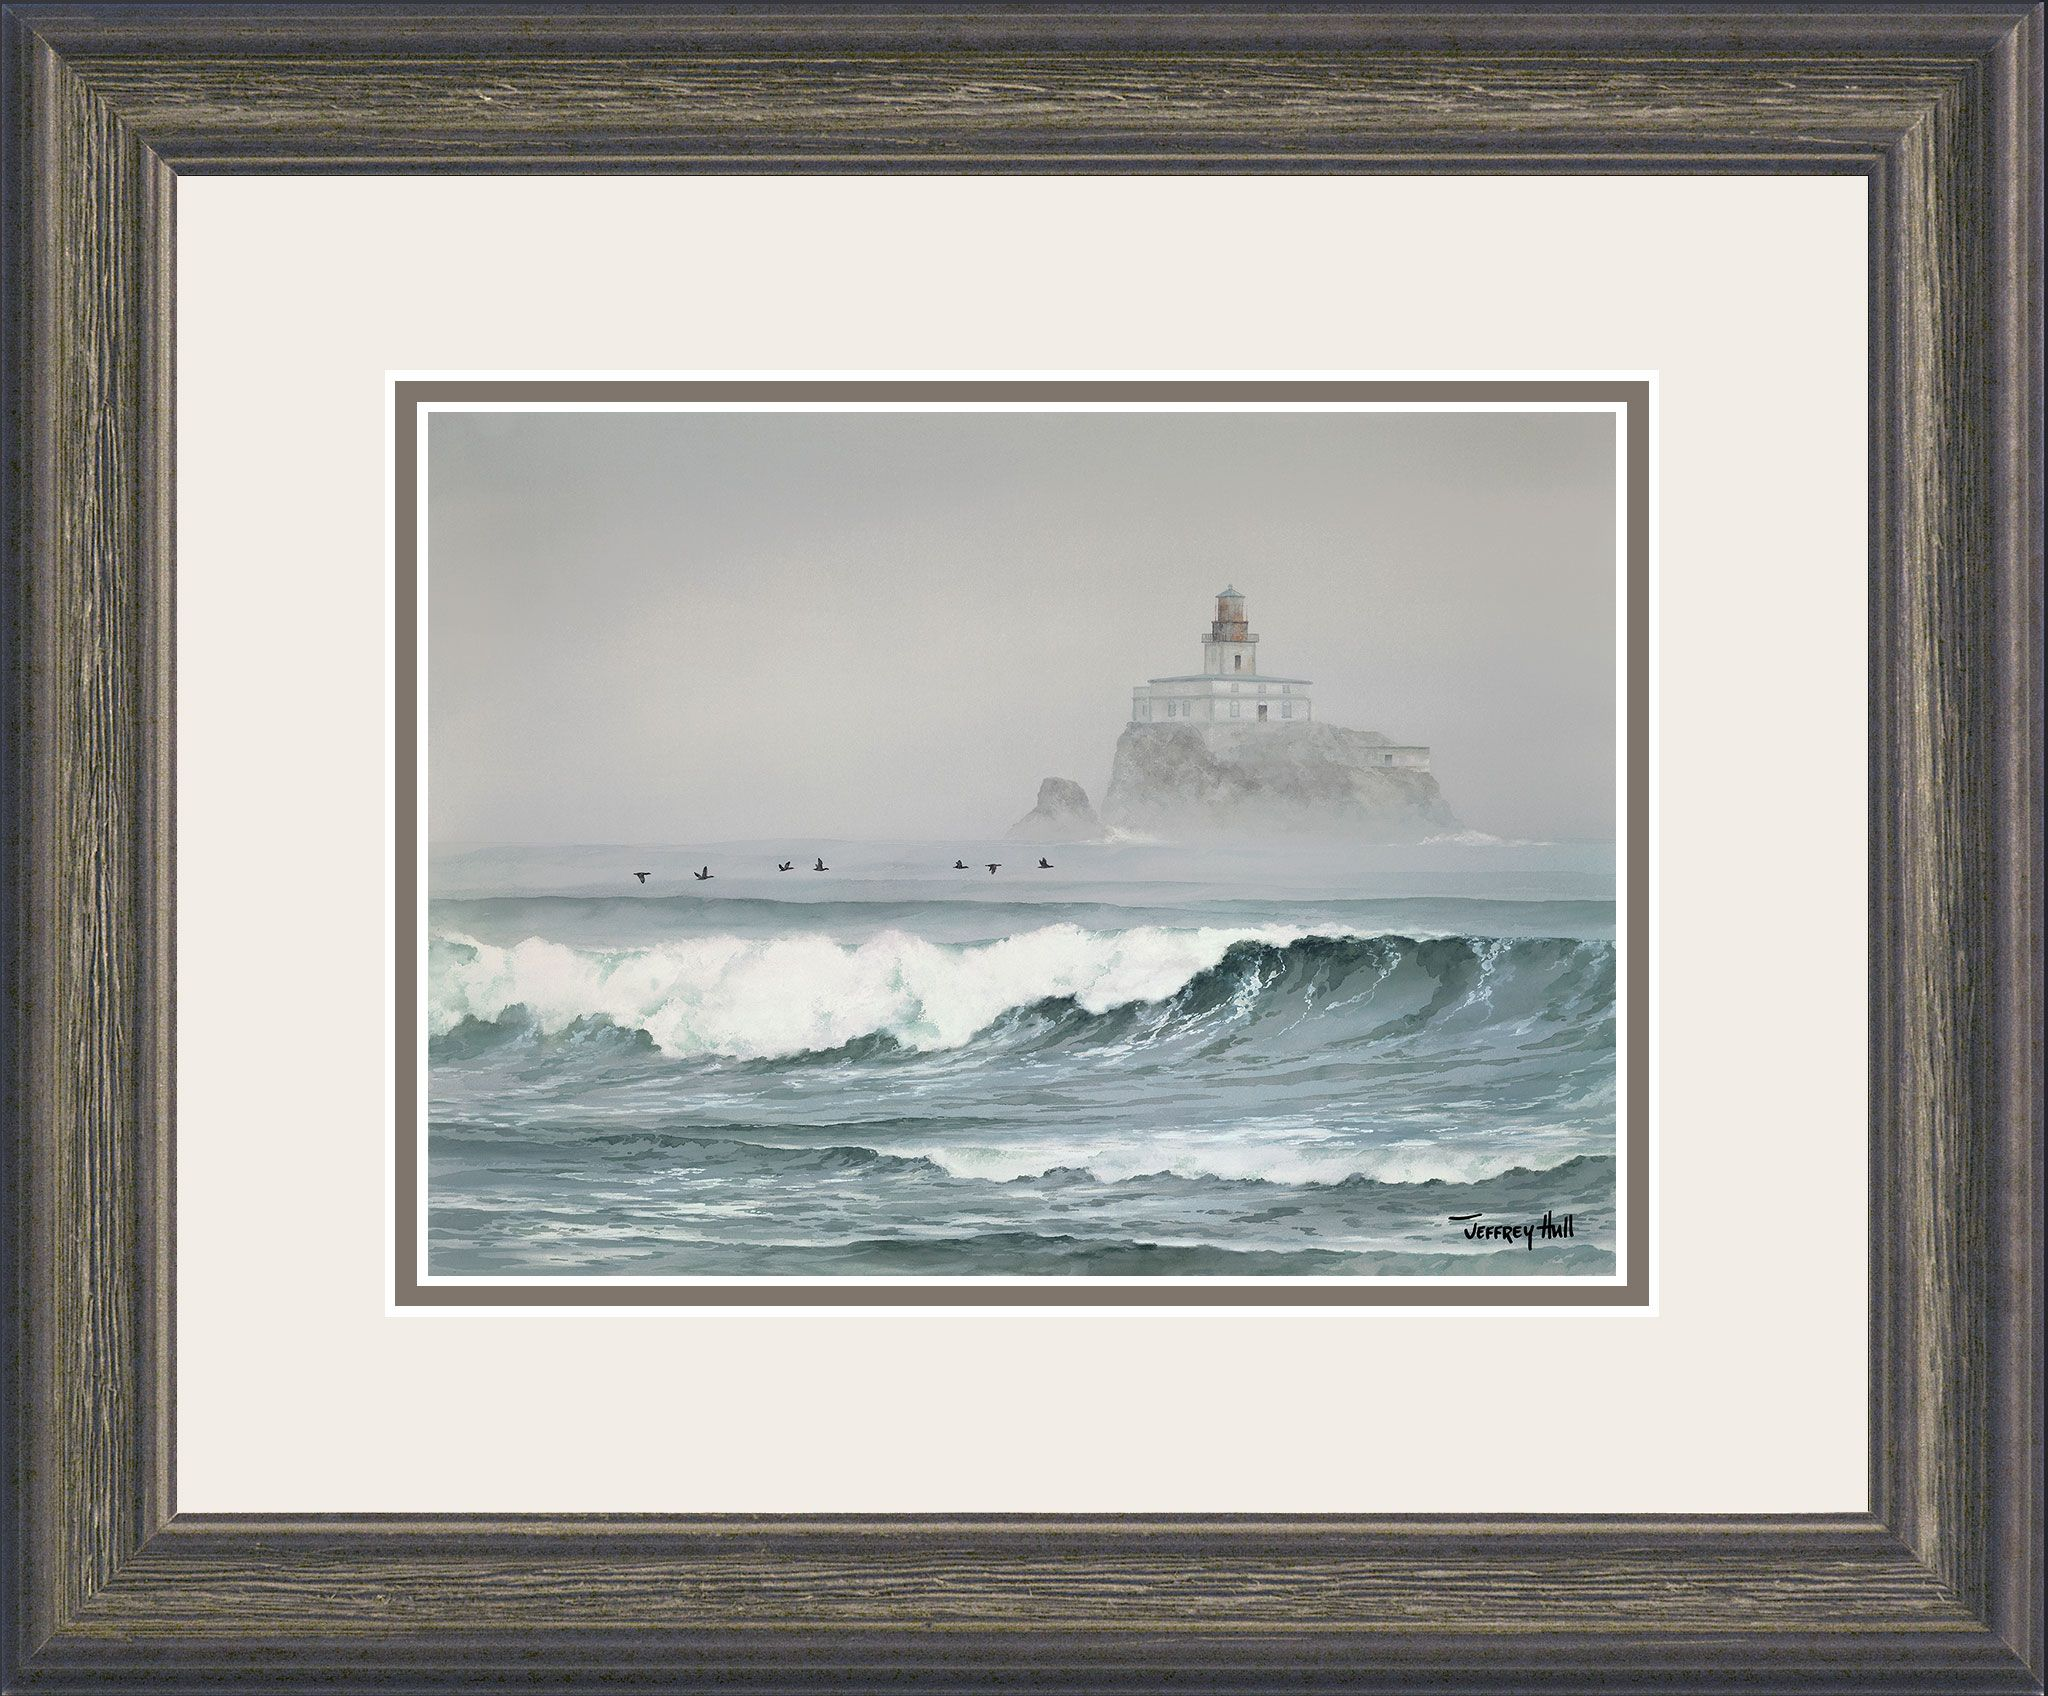 Tillamook-Rock-Lighthouse-Mini-Cascade-Talc-Balmoral-4-Website-2021